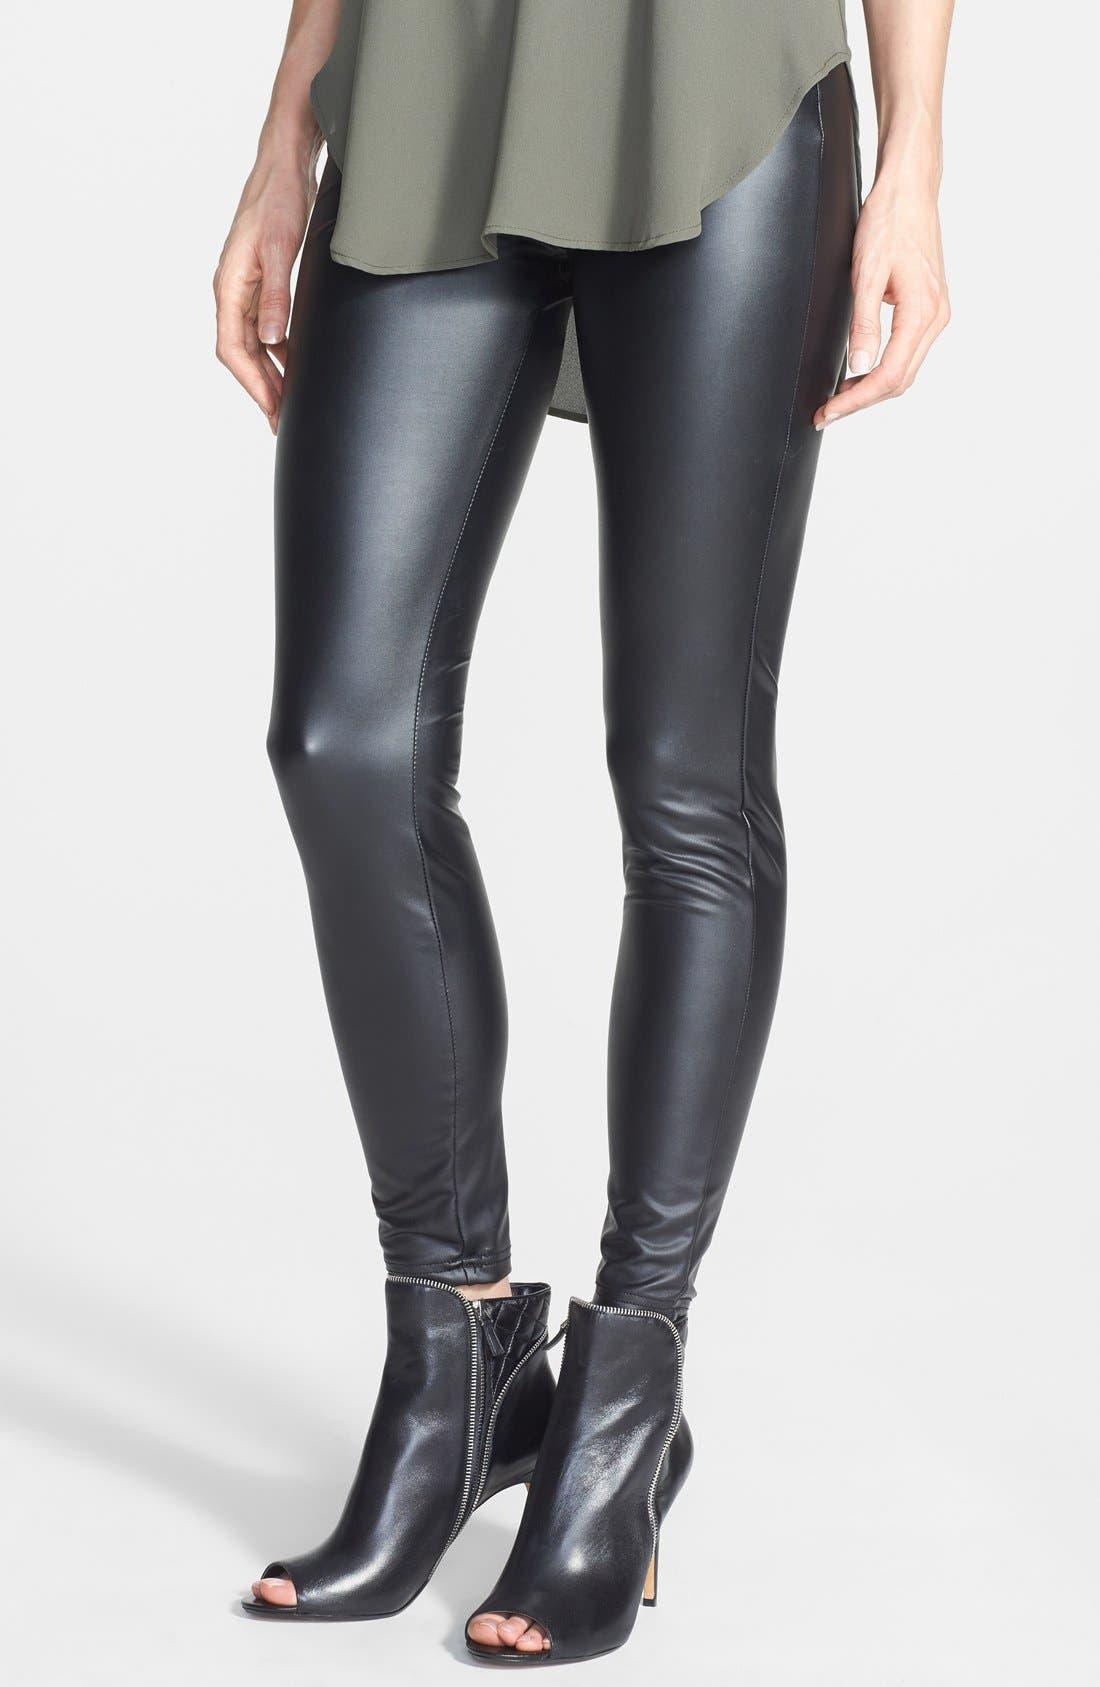 HUE 'Leatherette' Leggings, Main, color, 001